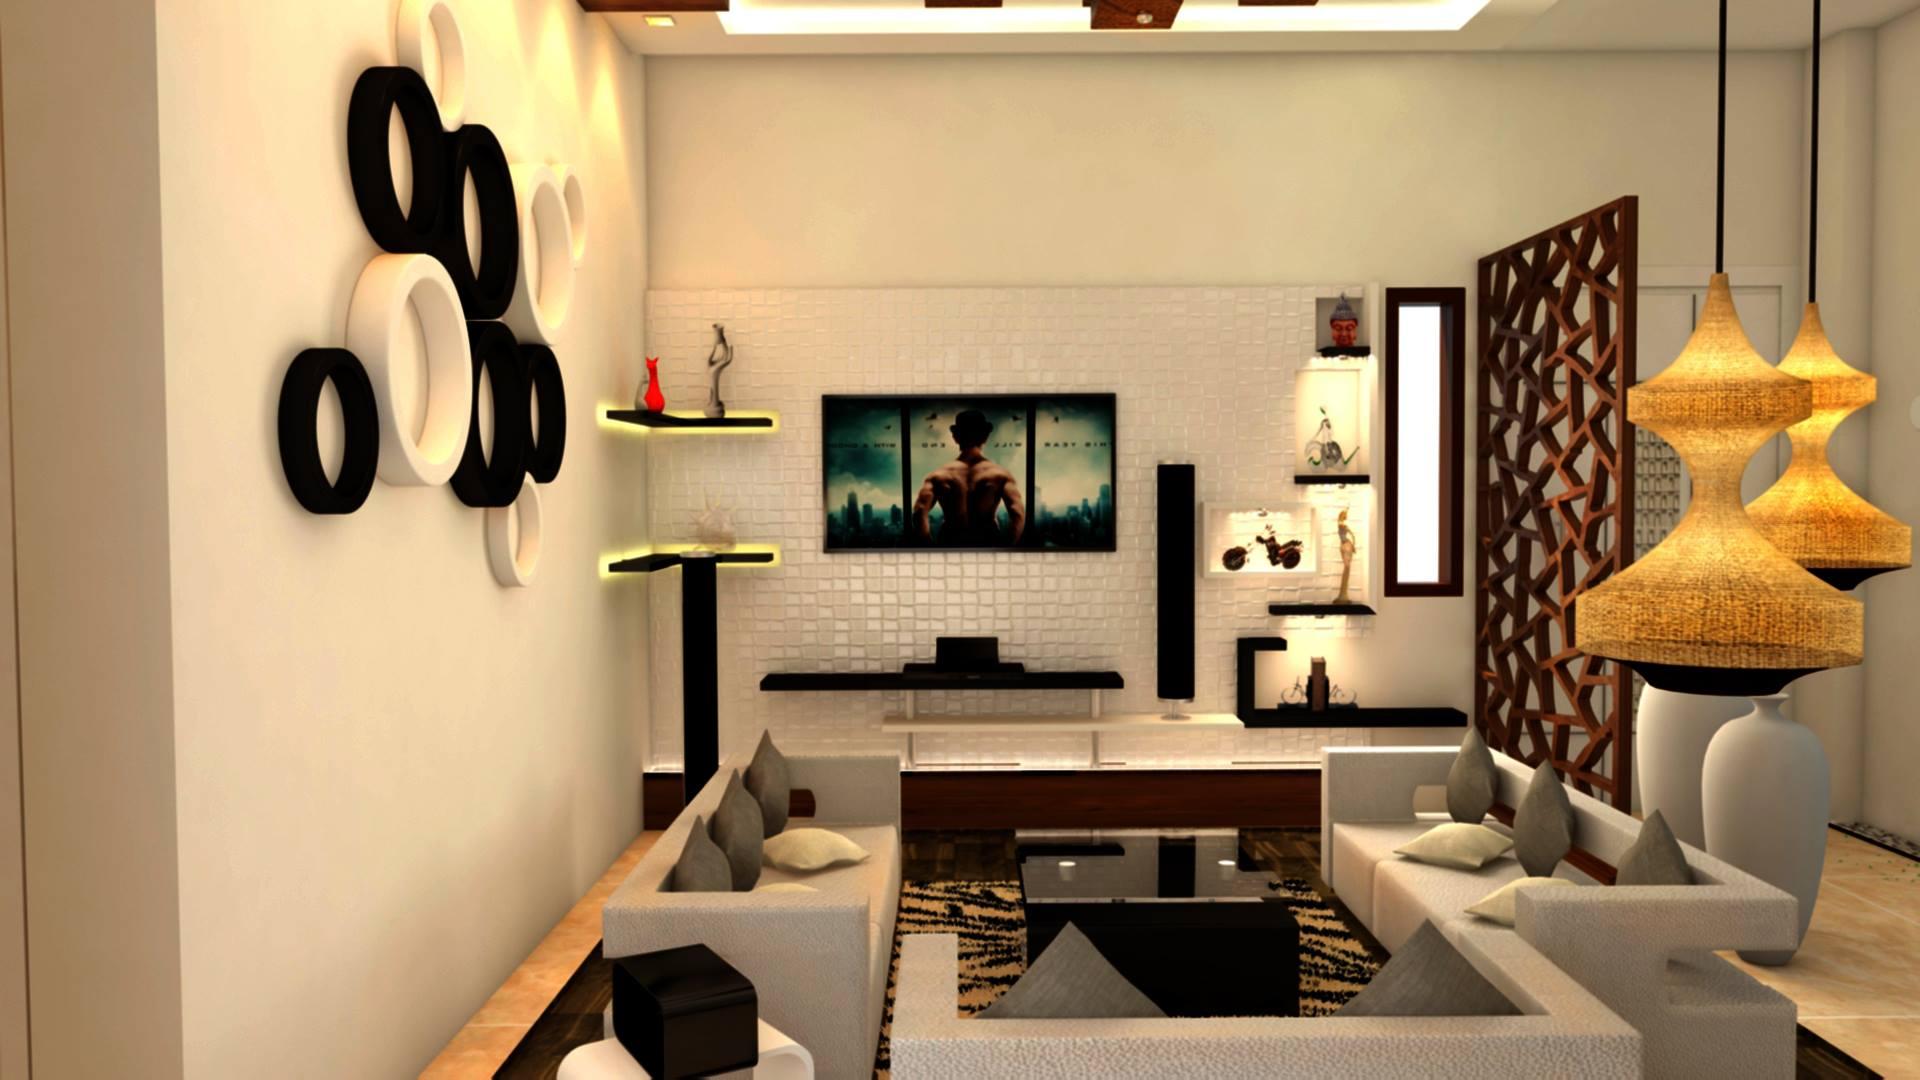 Bupesh Seethala Interior Designer 3 D Visualizer And